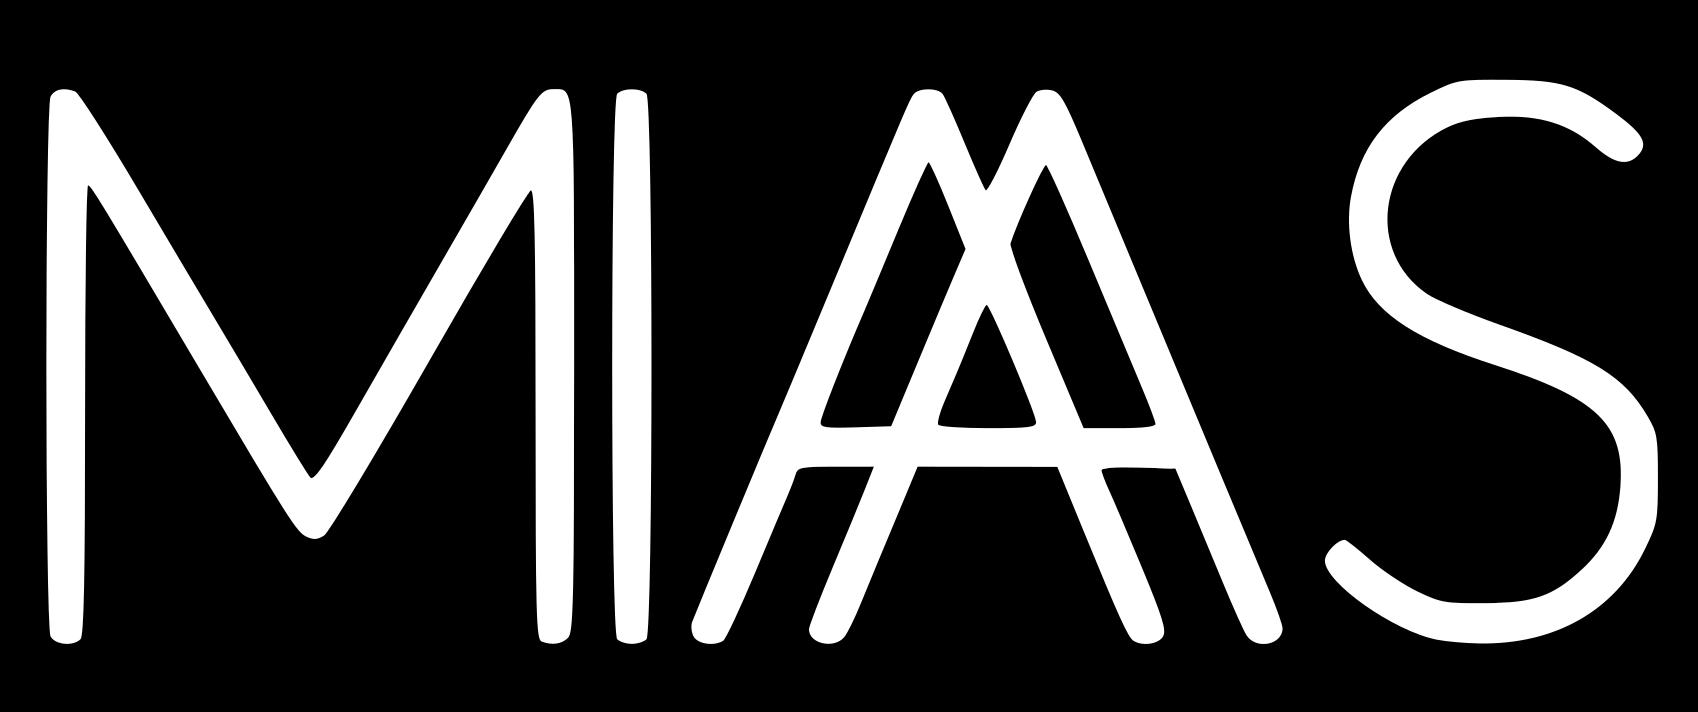 MIAAS